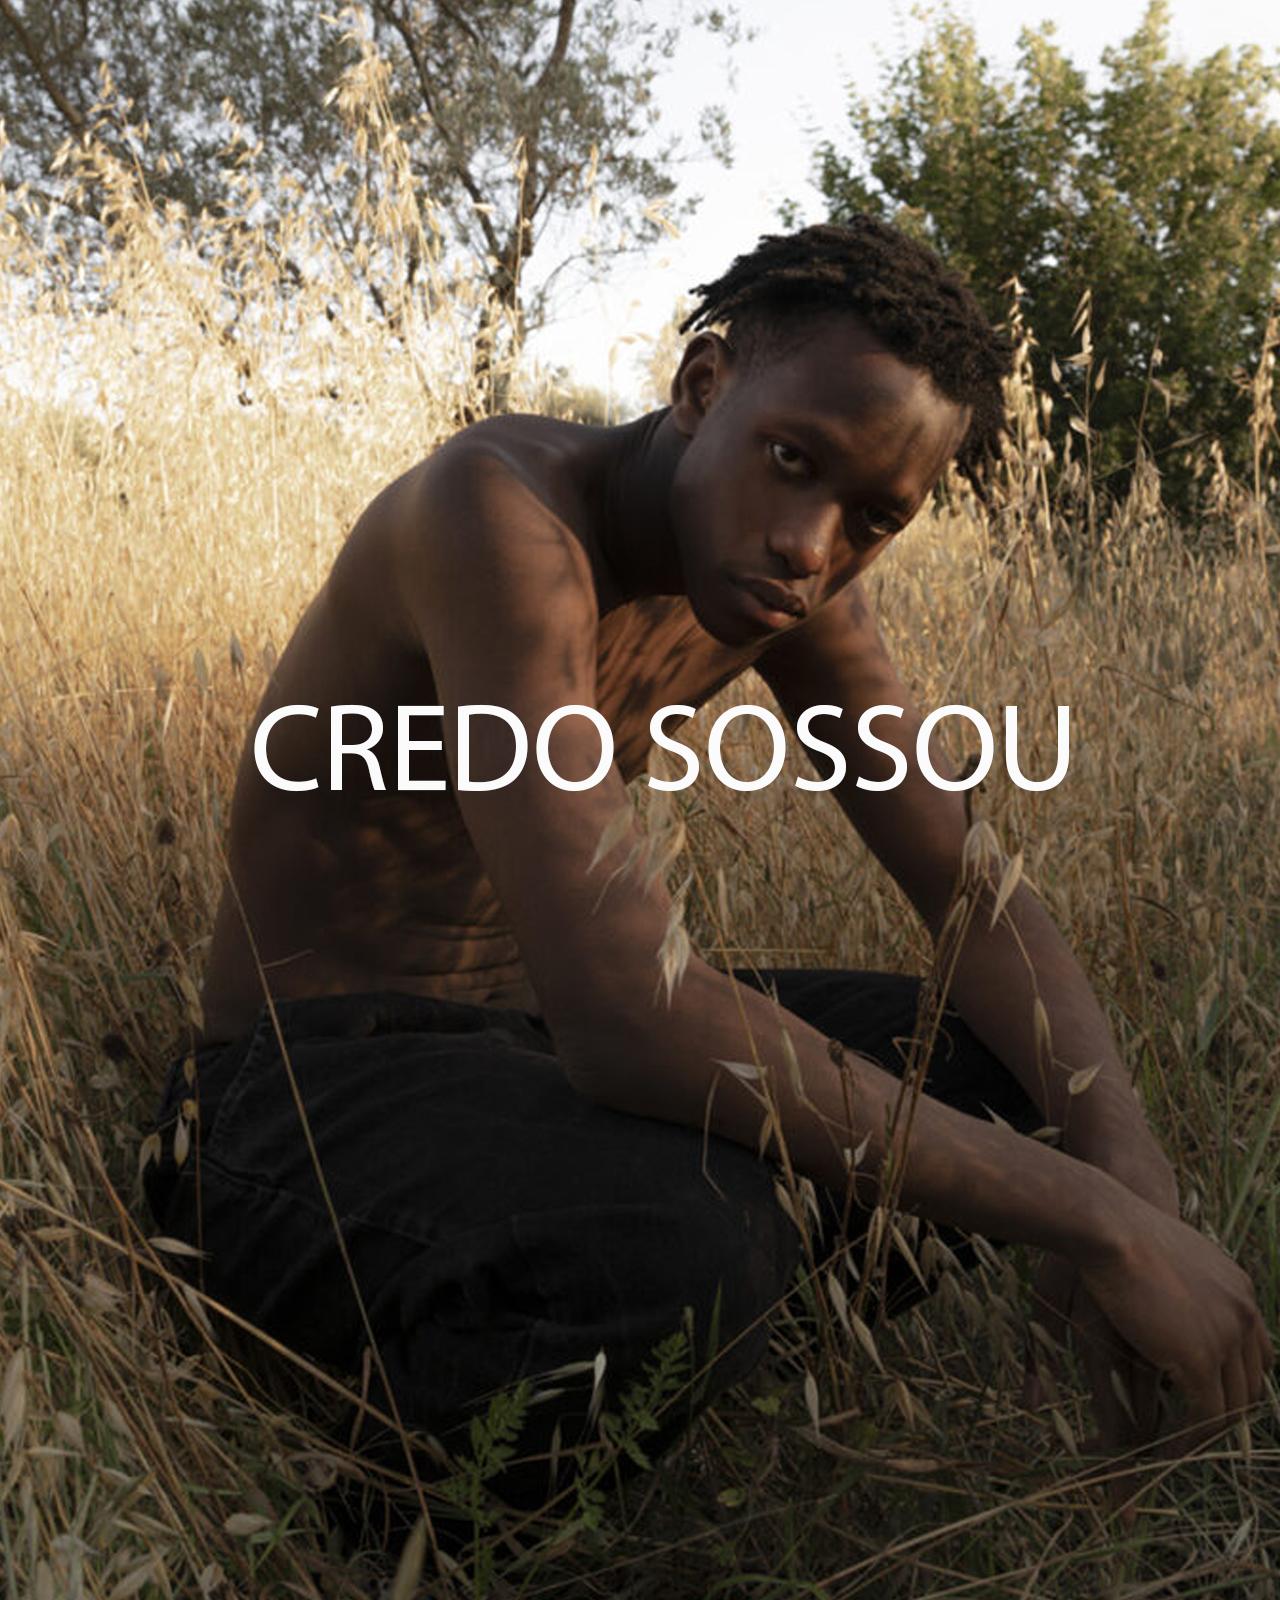 Credo Sossou by Andrea Reina